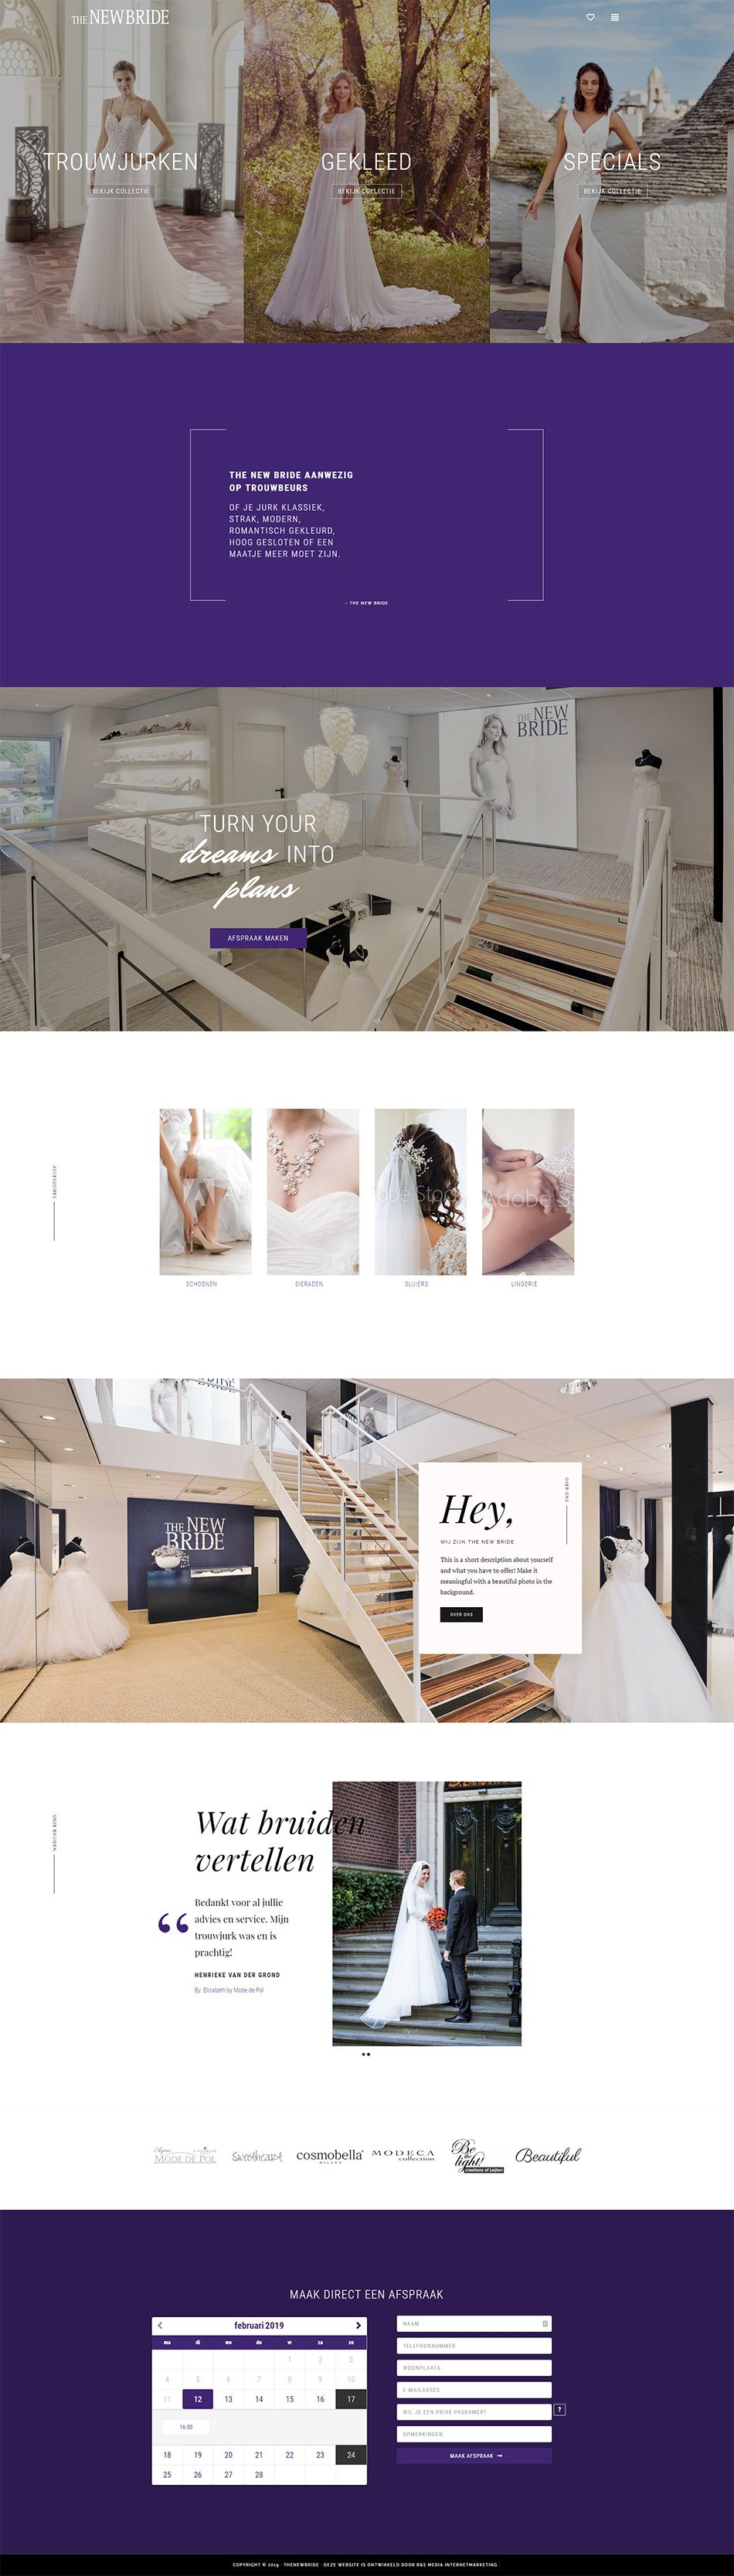 Webdesign The New Bride